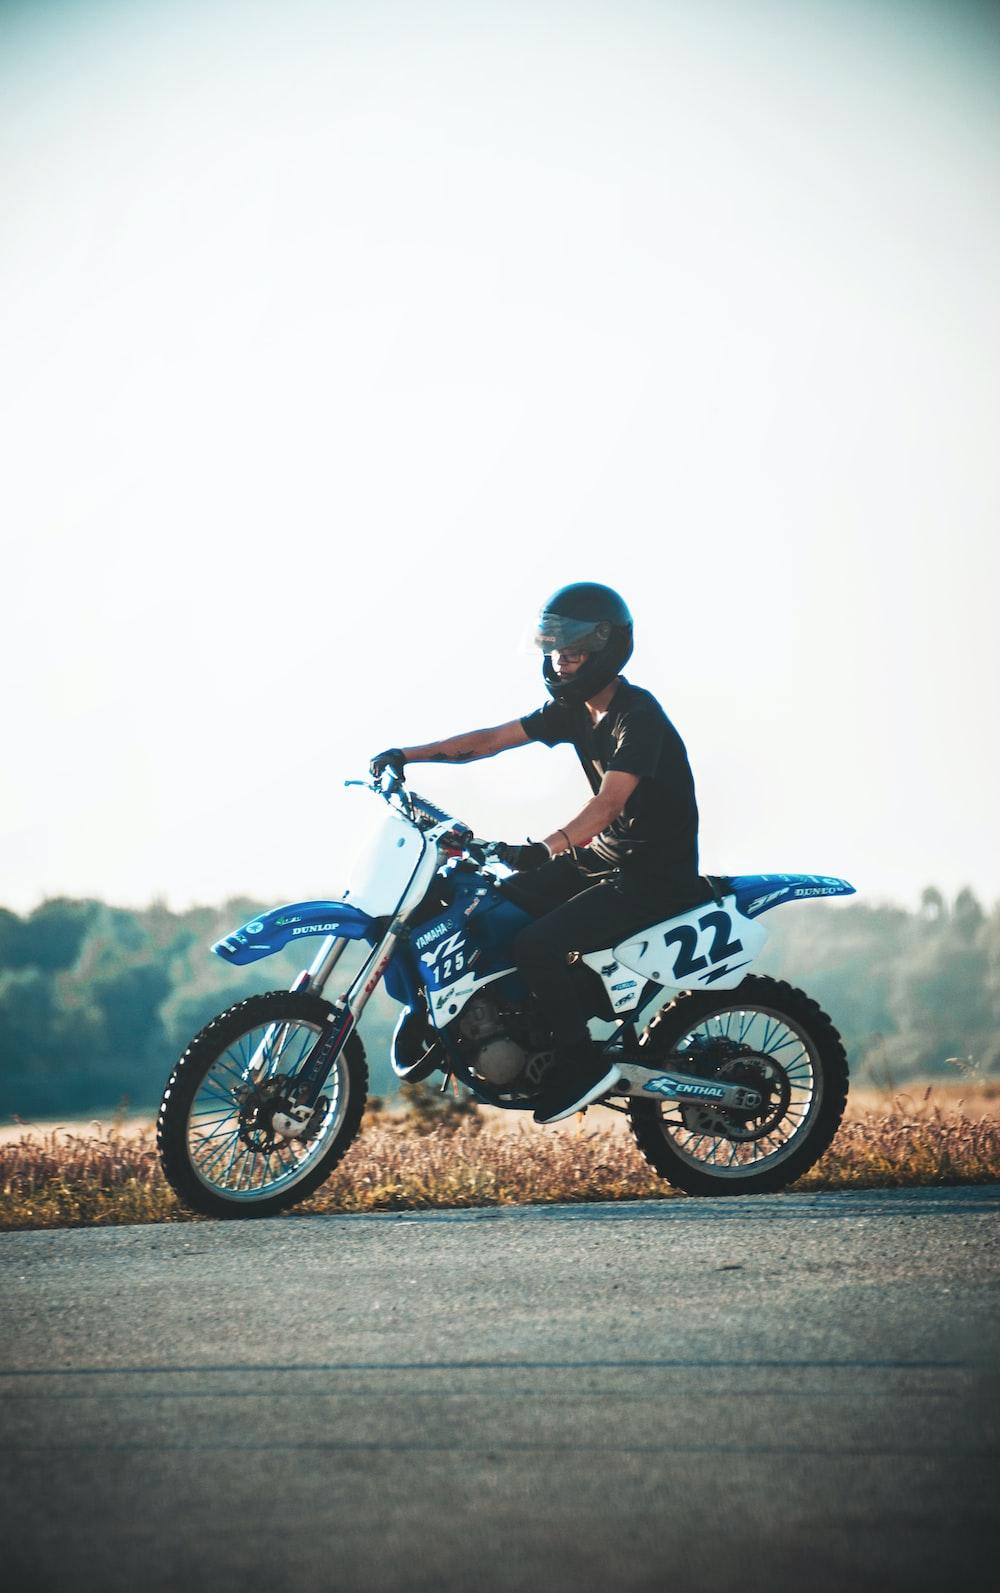 man riding dirt bike